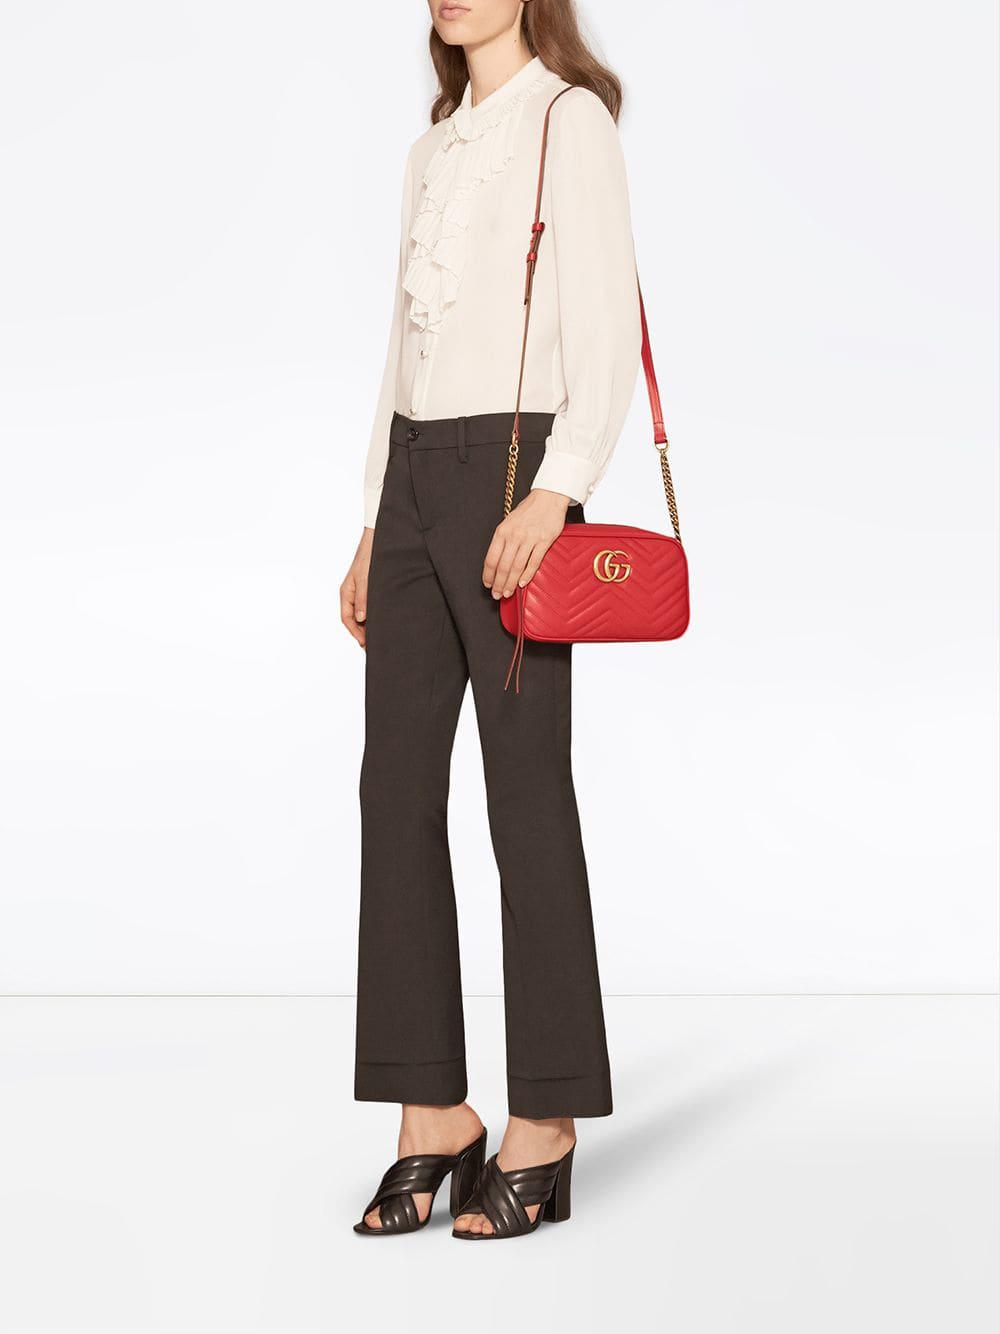 370fe4356305 Gucci - Red GG Marmont Small Matelassé Shoulder Bag - Lyst. View fullscreen